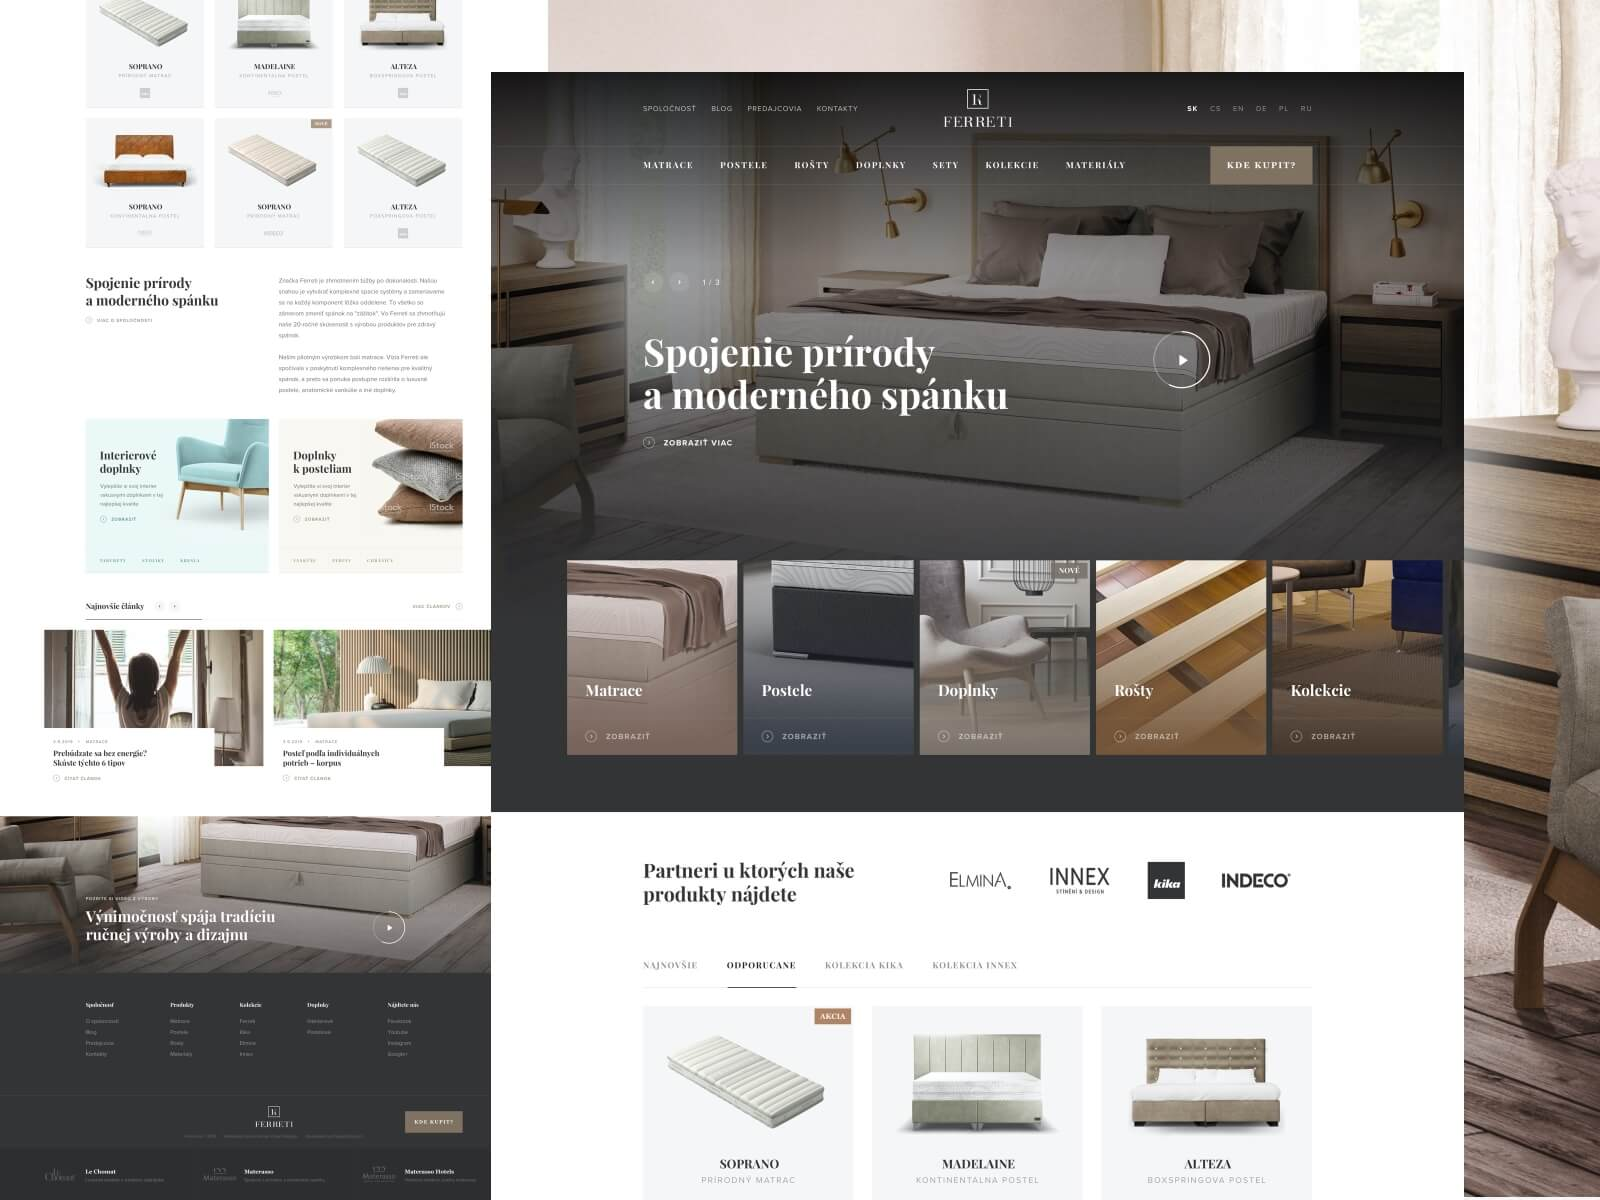 Design for a homepage of a interior design company